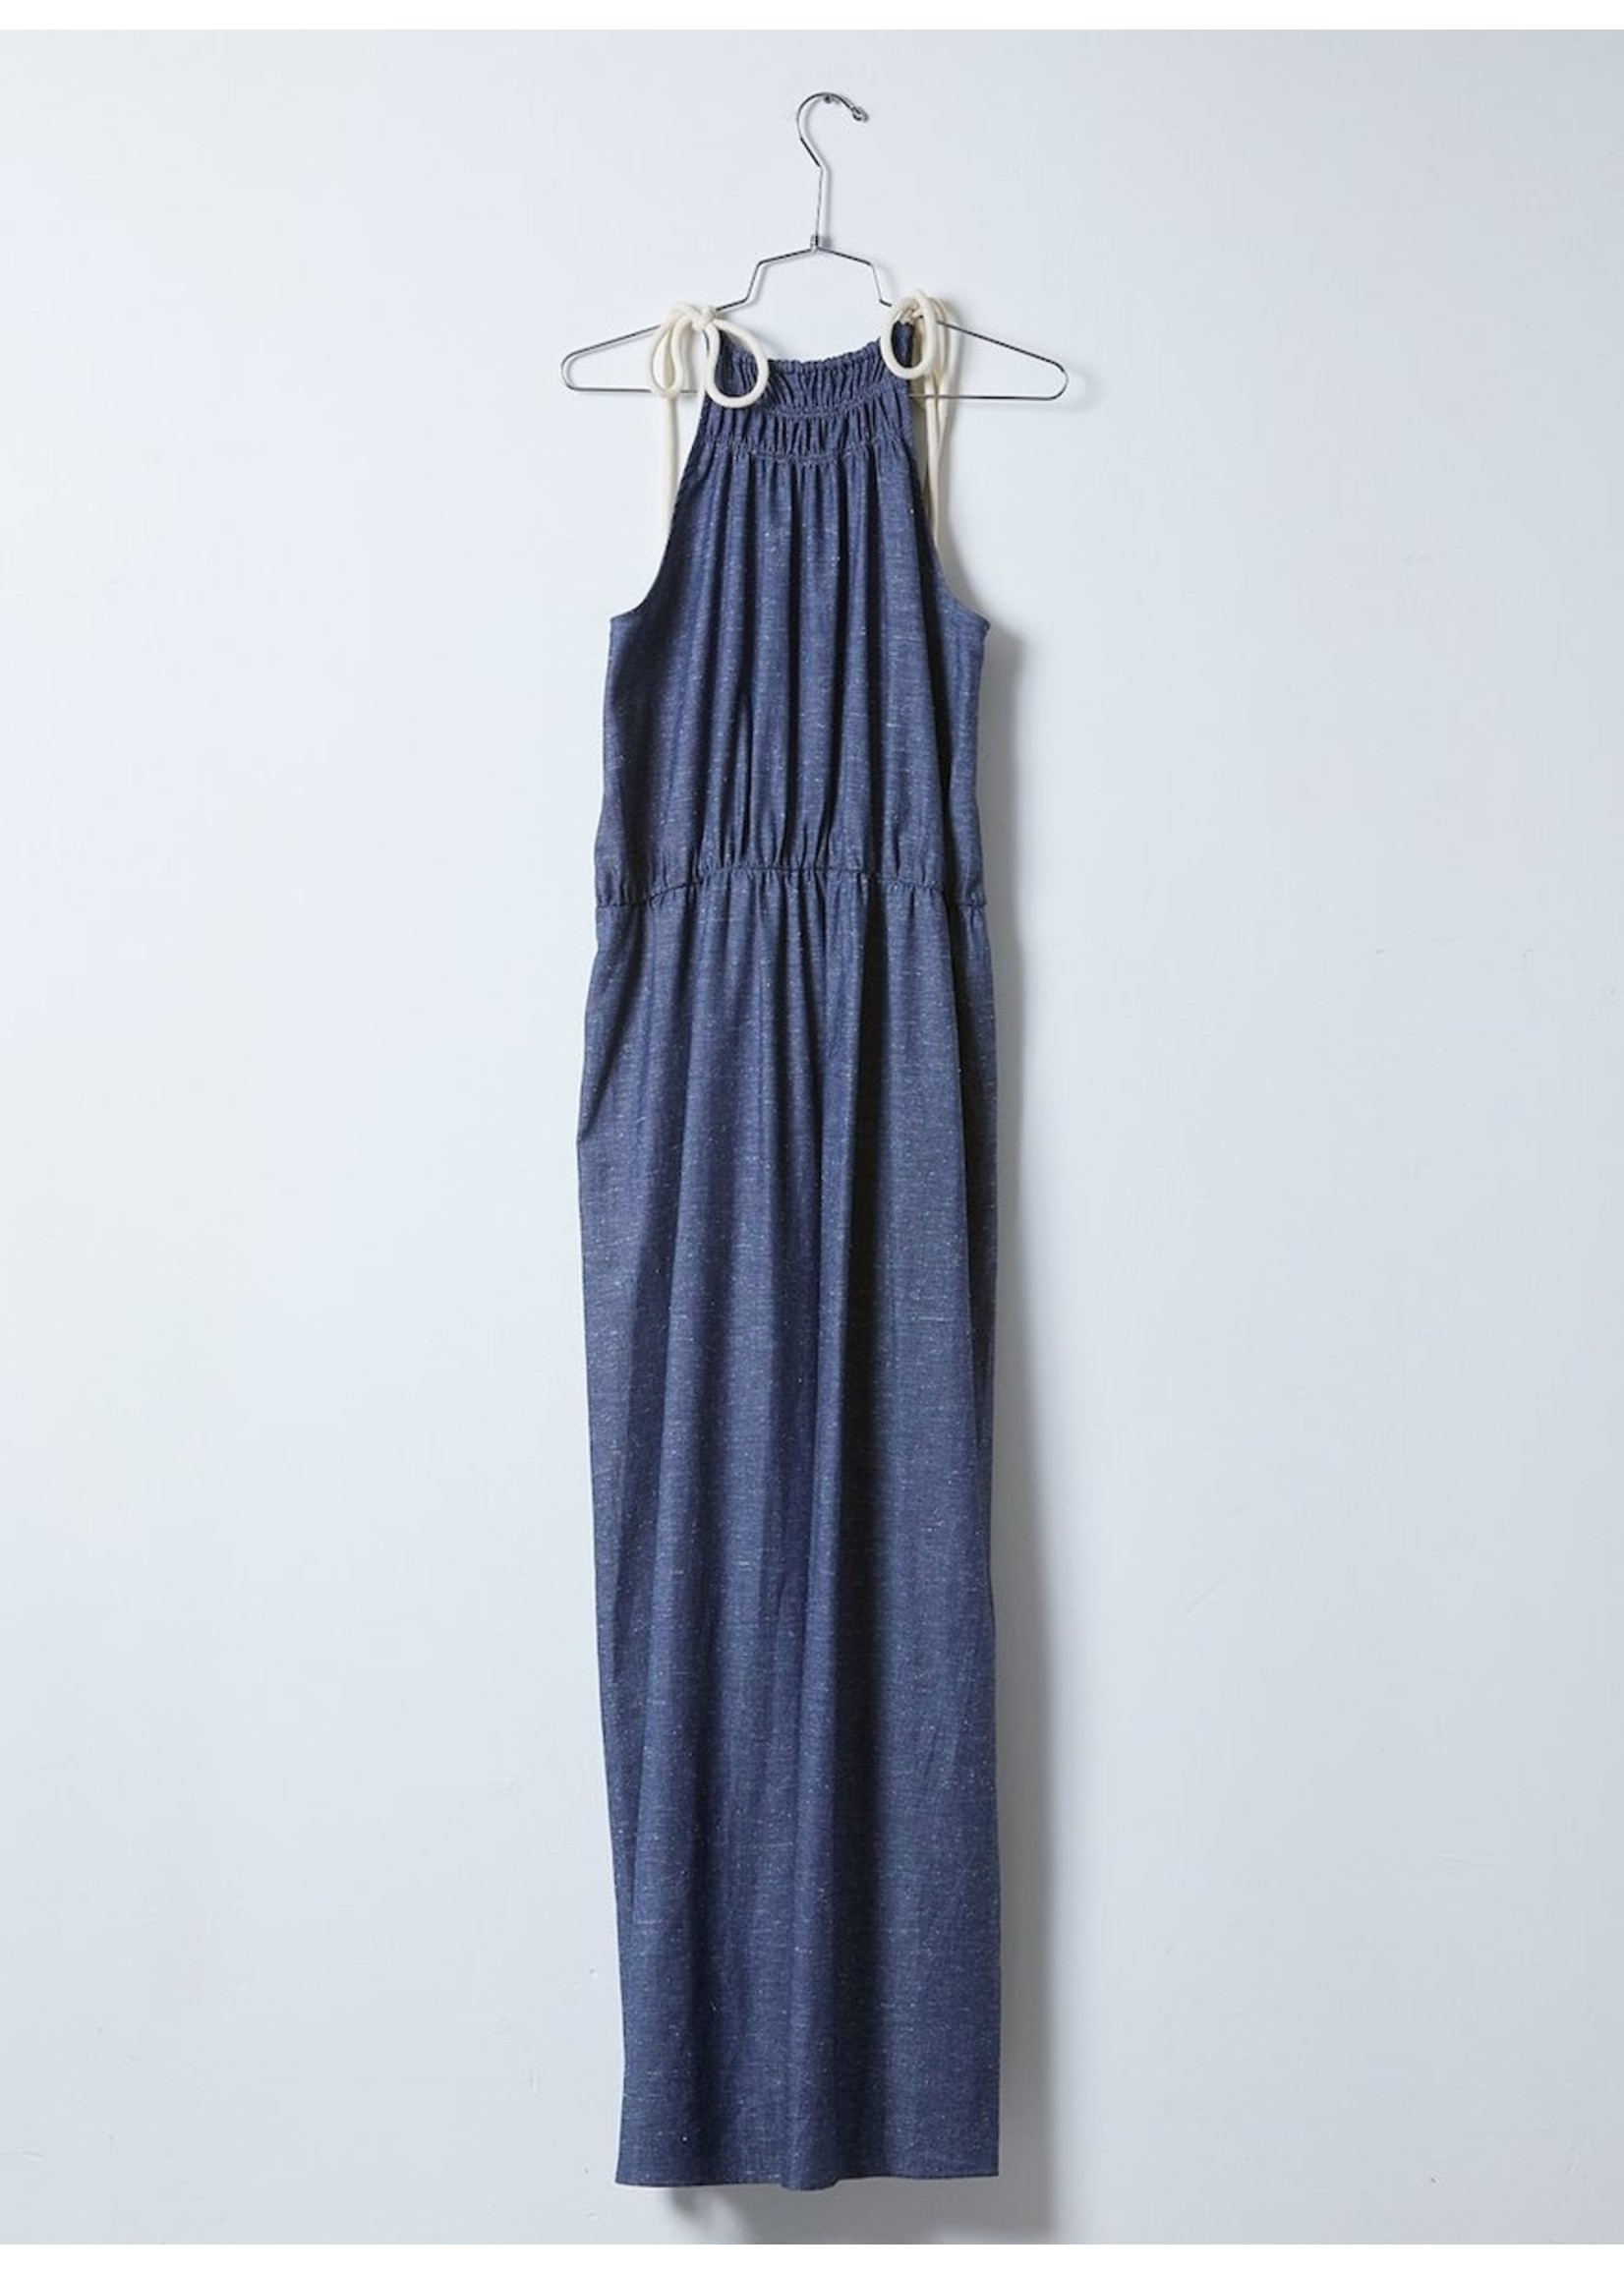 Atelier Delphine Atelier Delphine Tomekon Sargent Dress